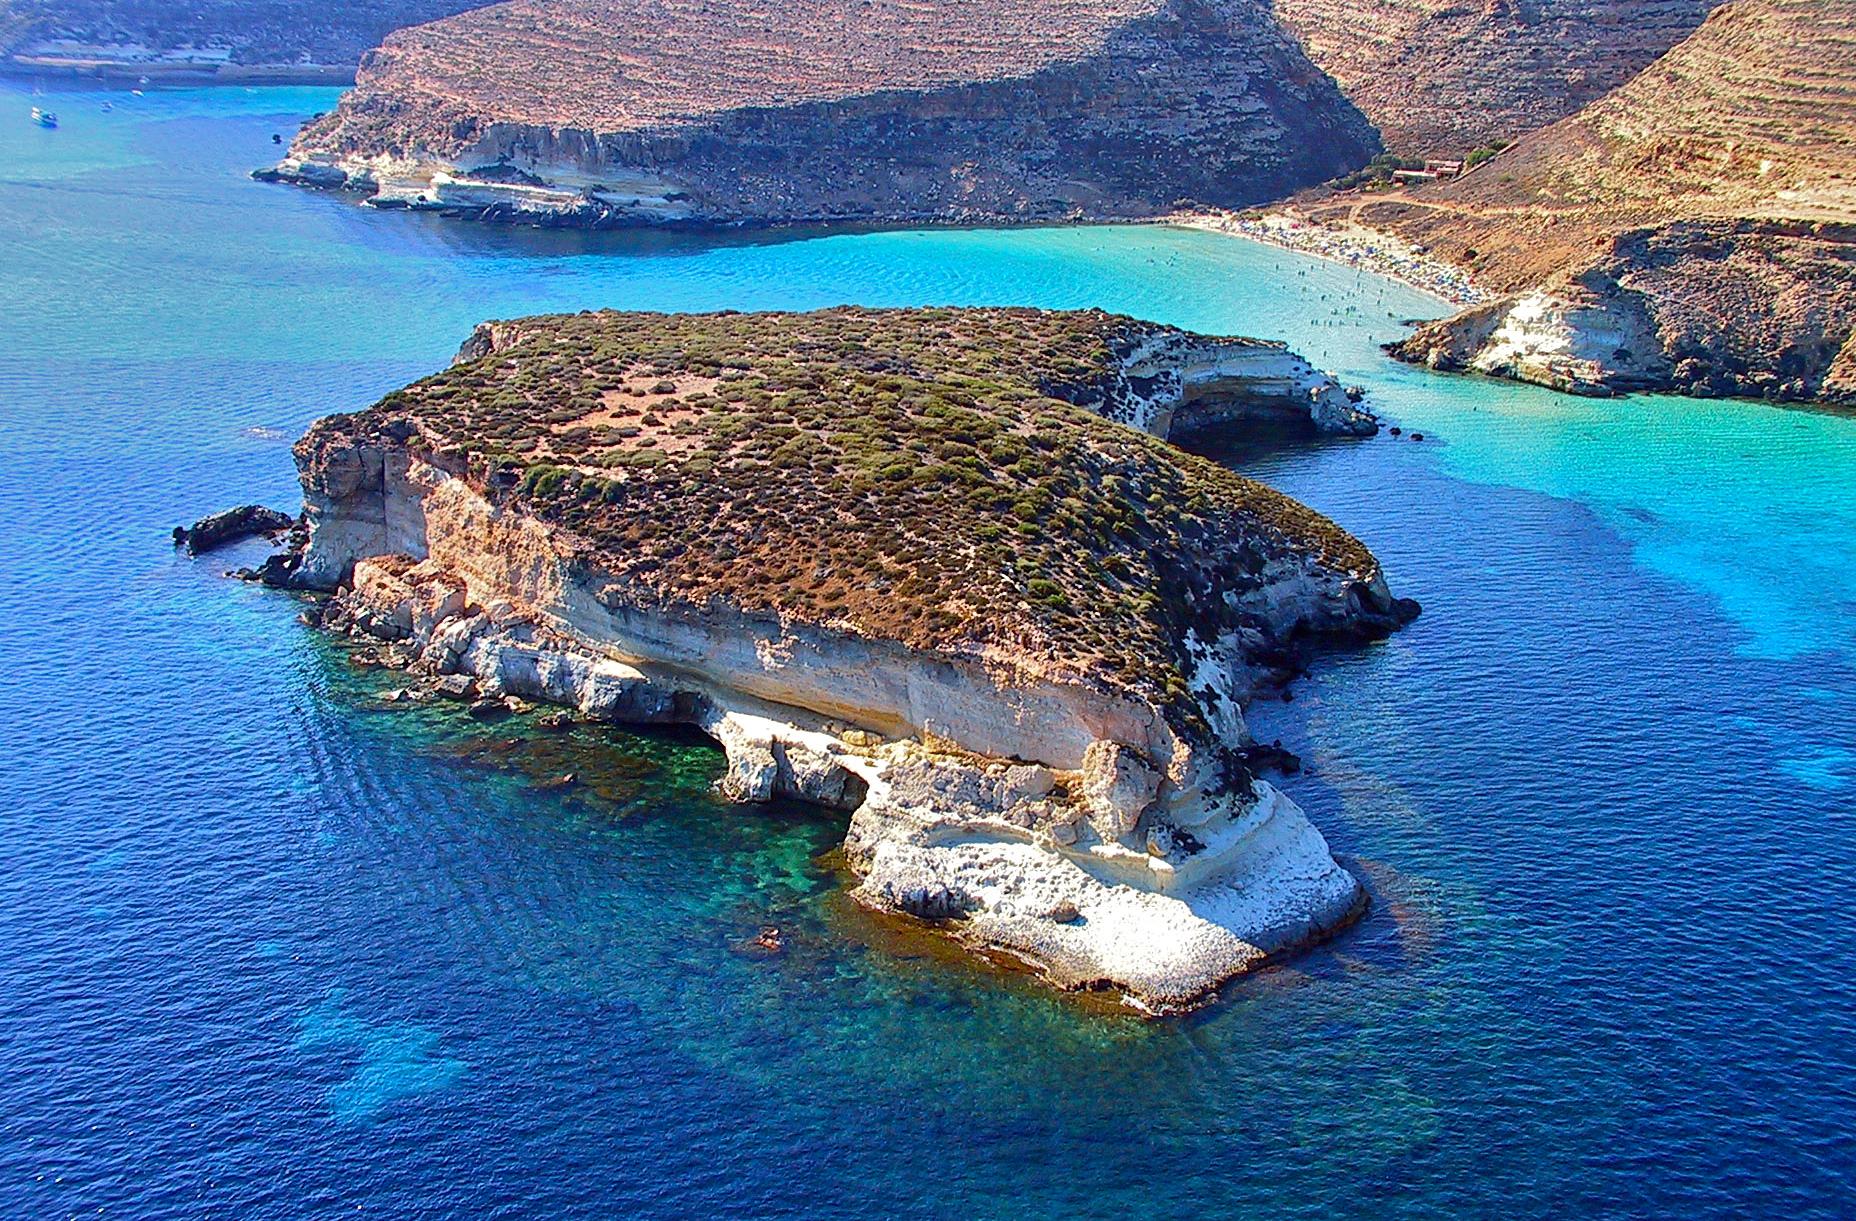 Európa 12 legkedveltebb tengerpartja - SSpiaggia del Conigli, Lampedusa, Szicília